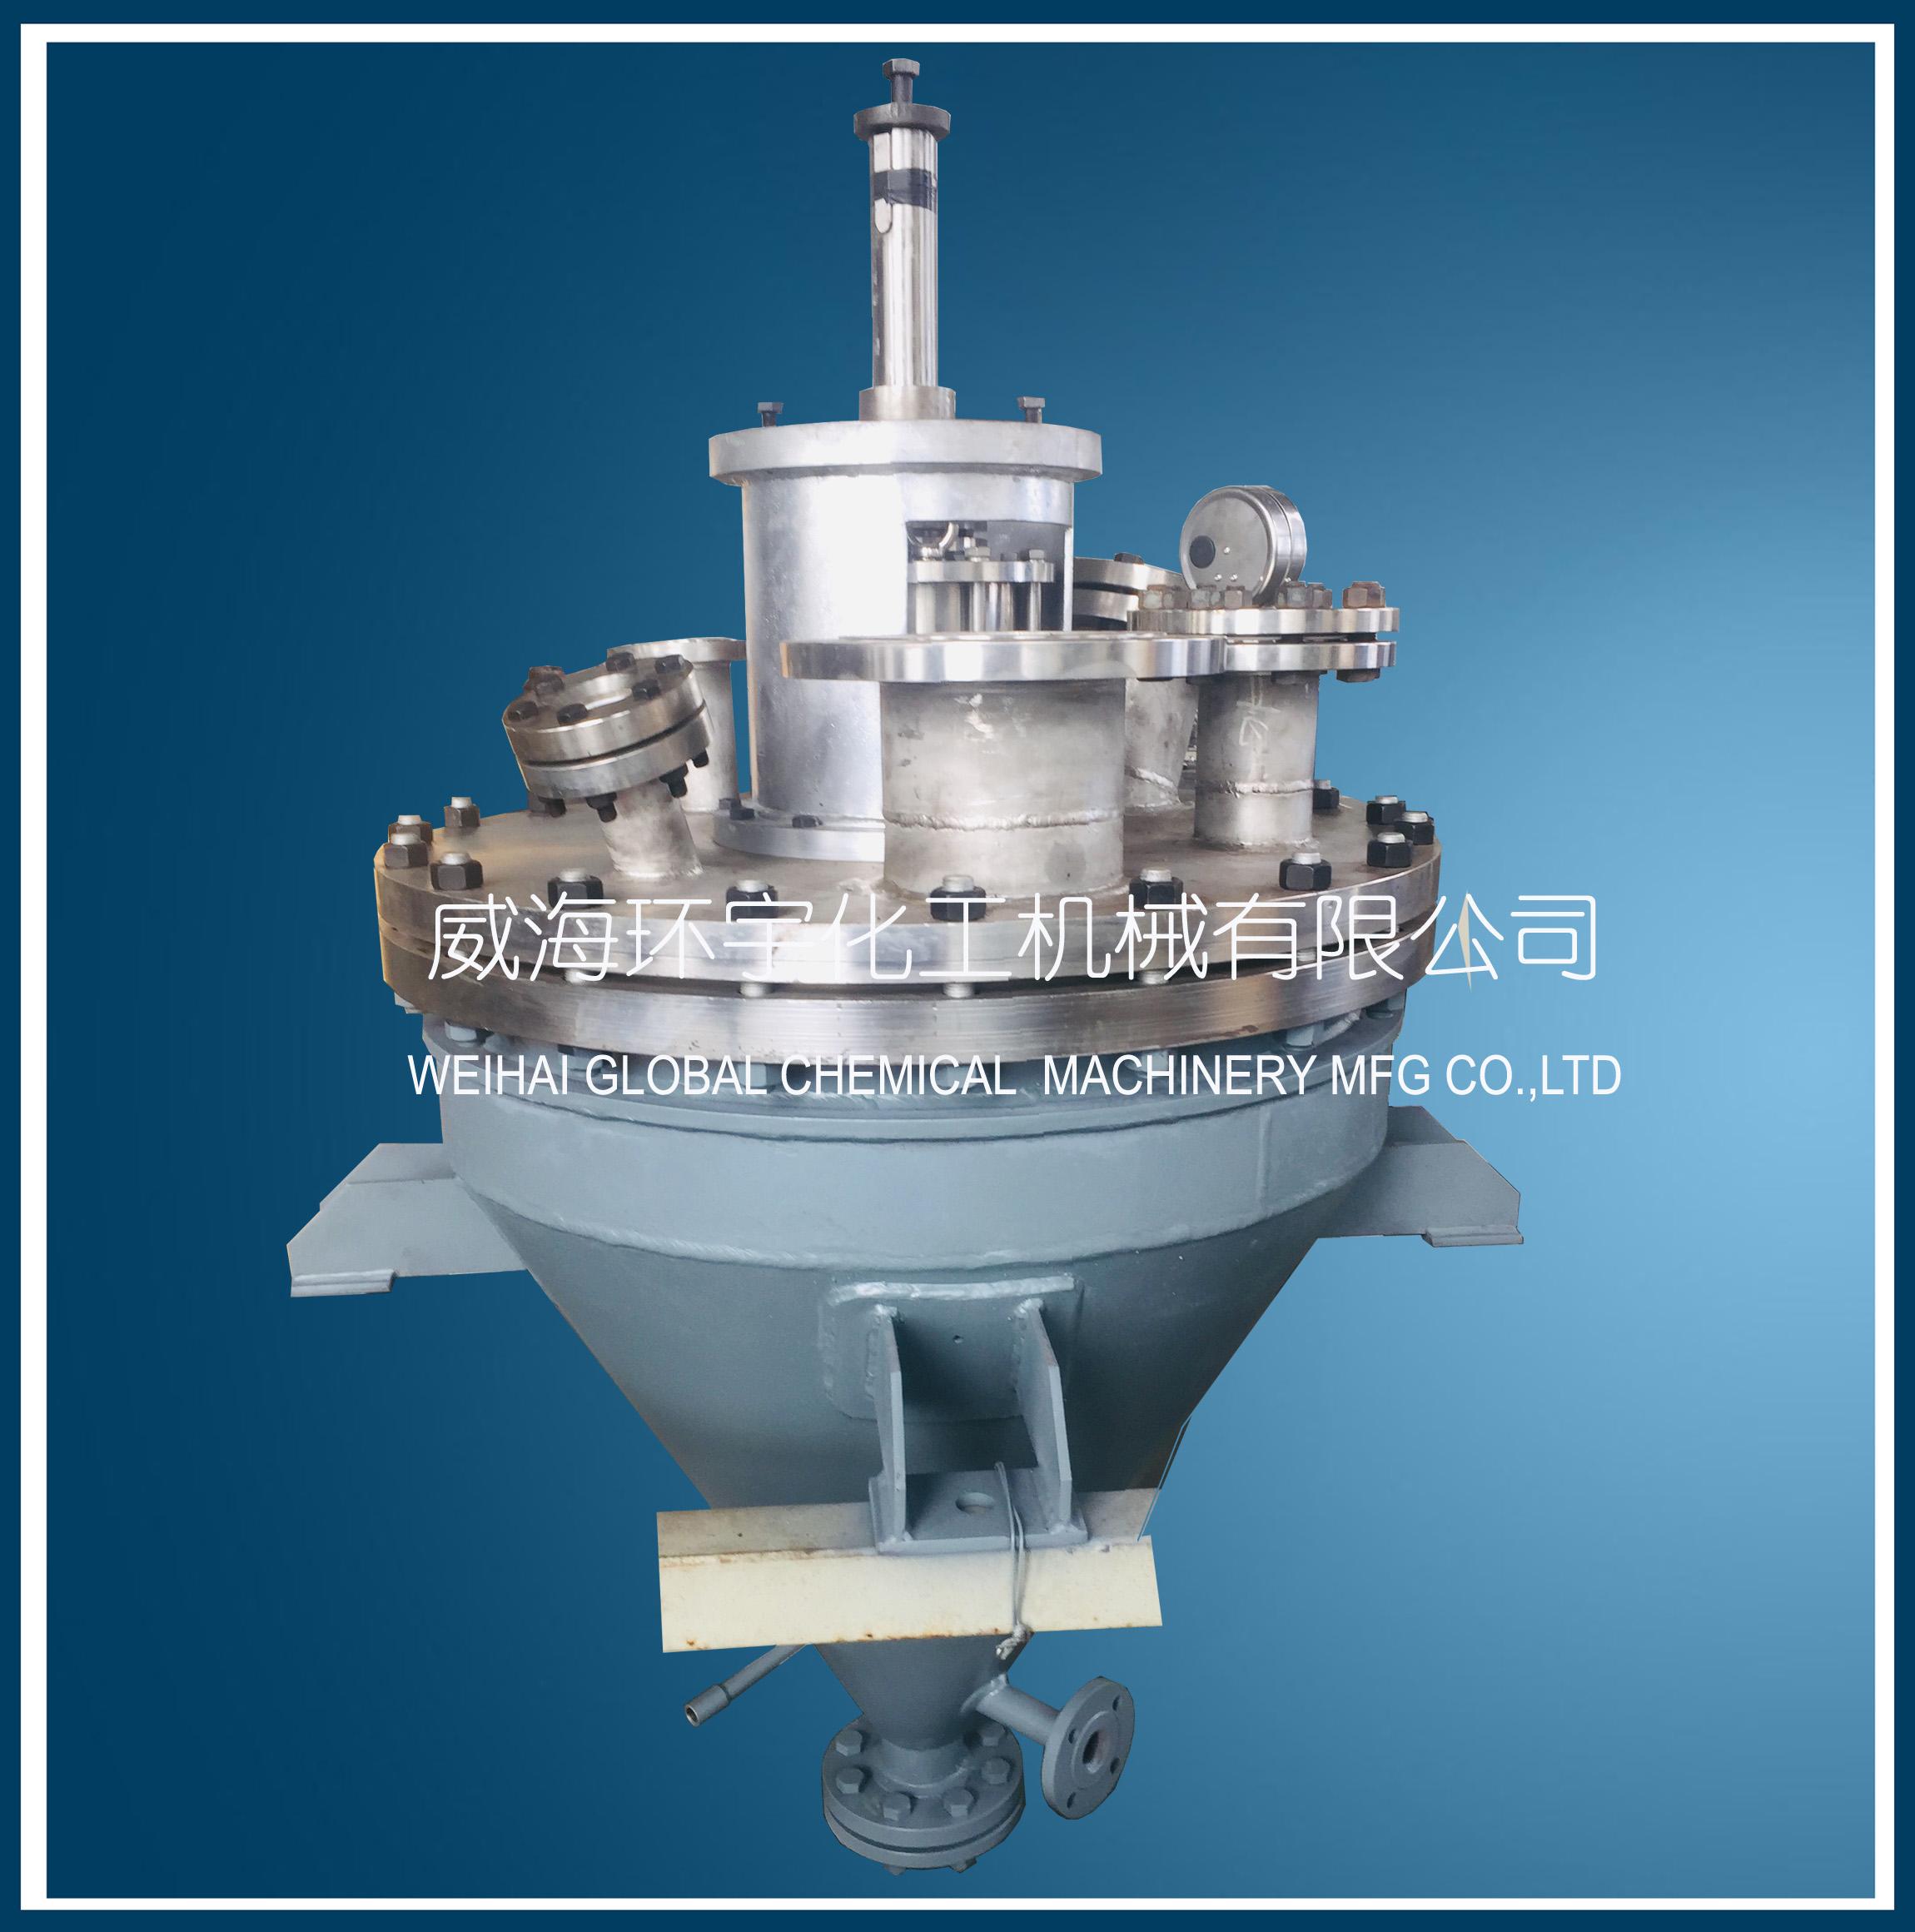 120L定制反应釜锥形封头已顺利完工发往北京客户处